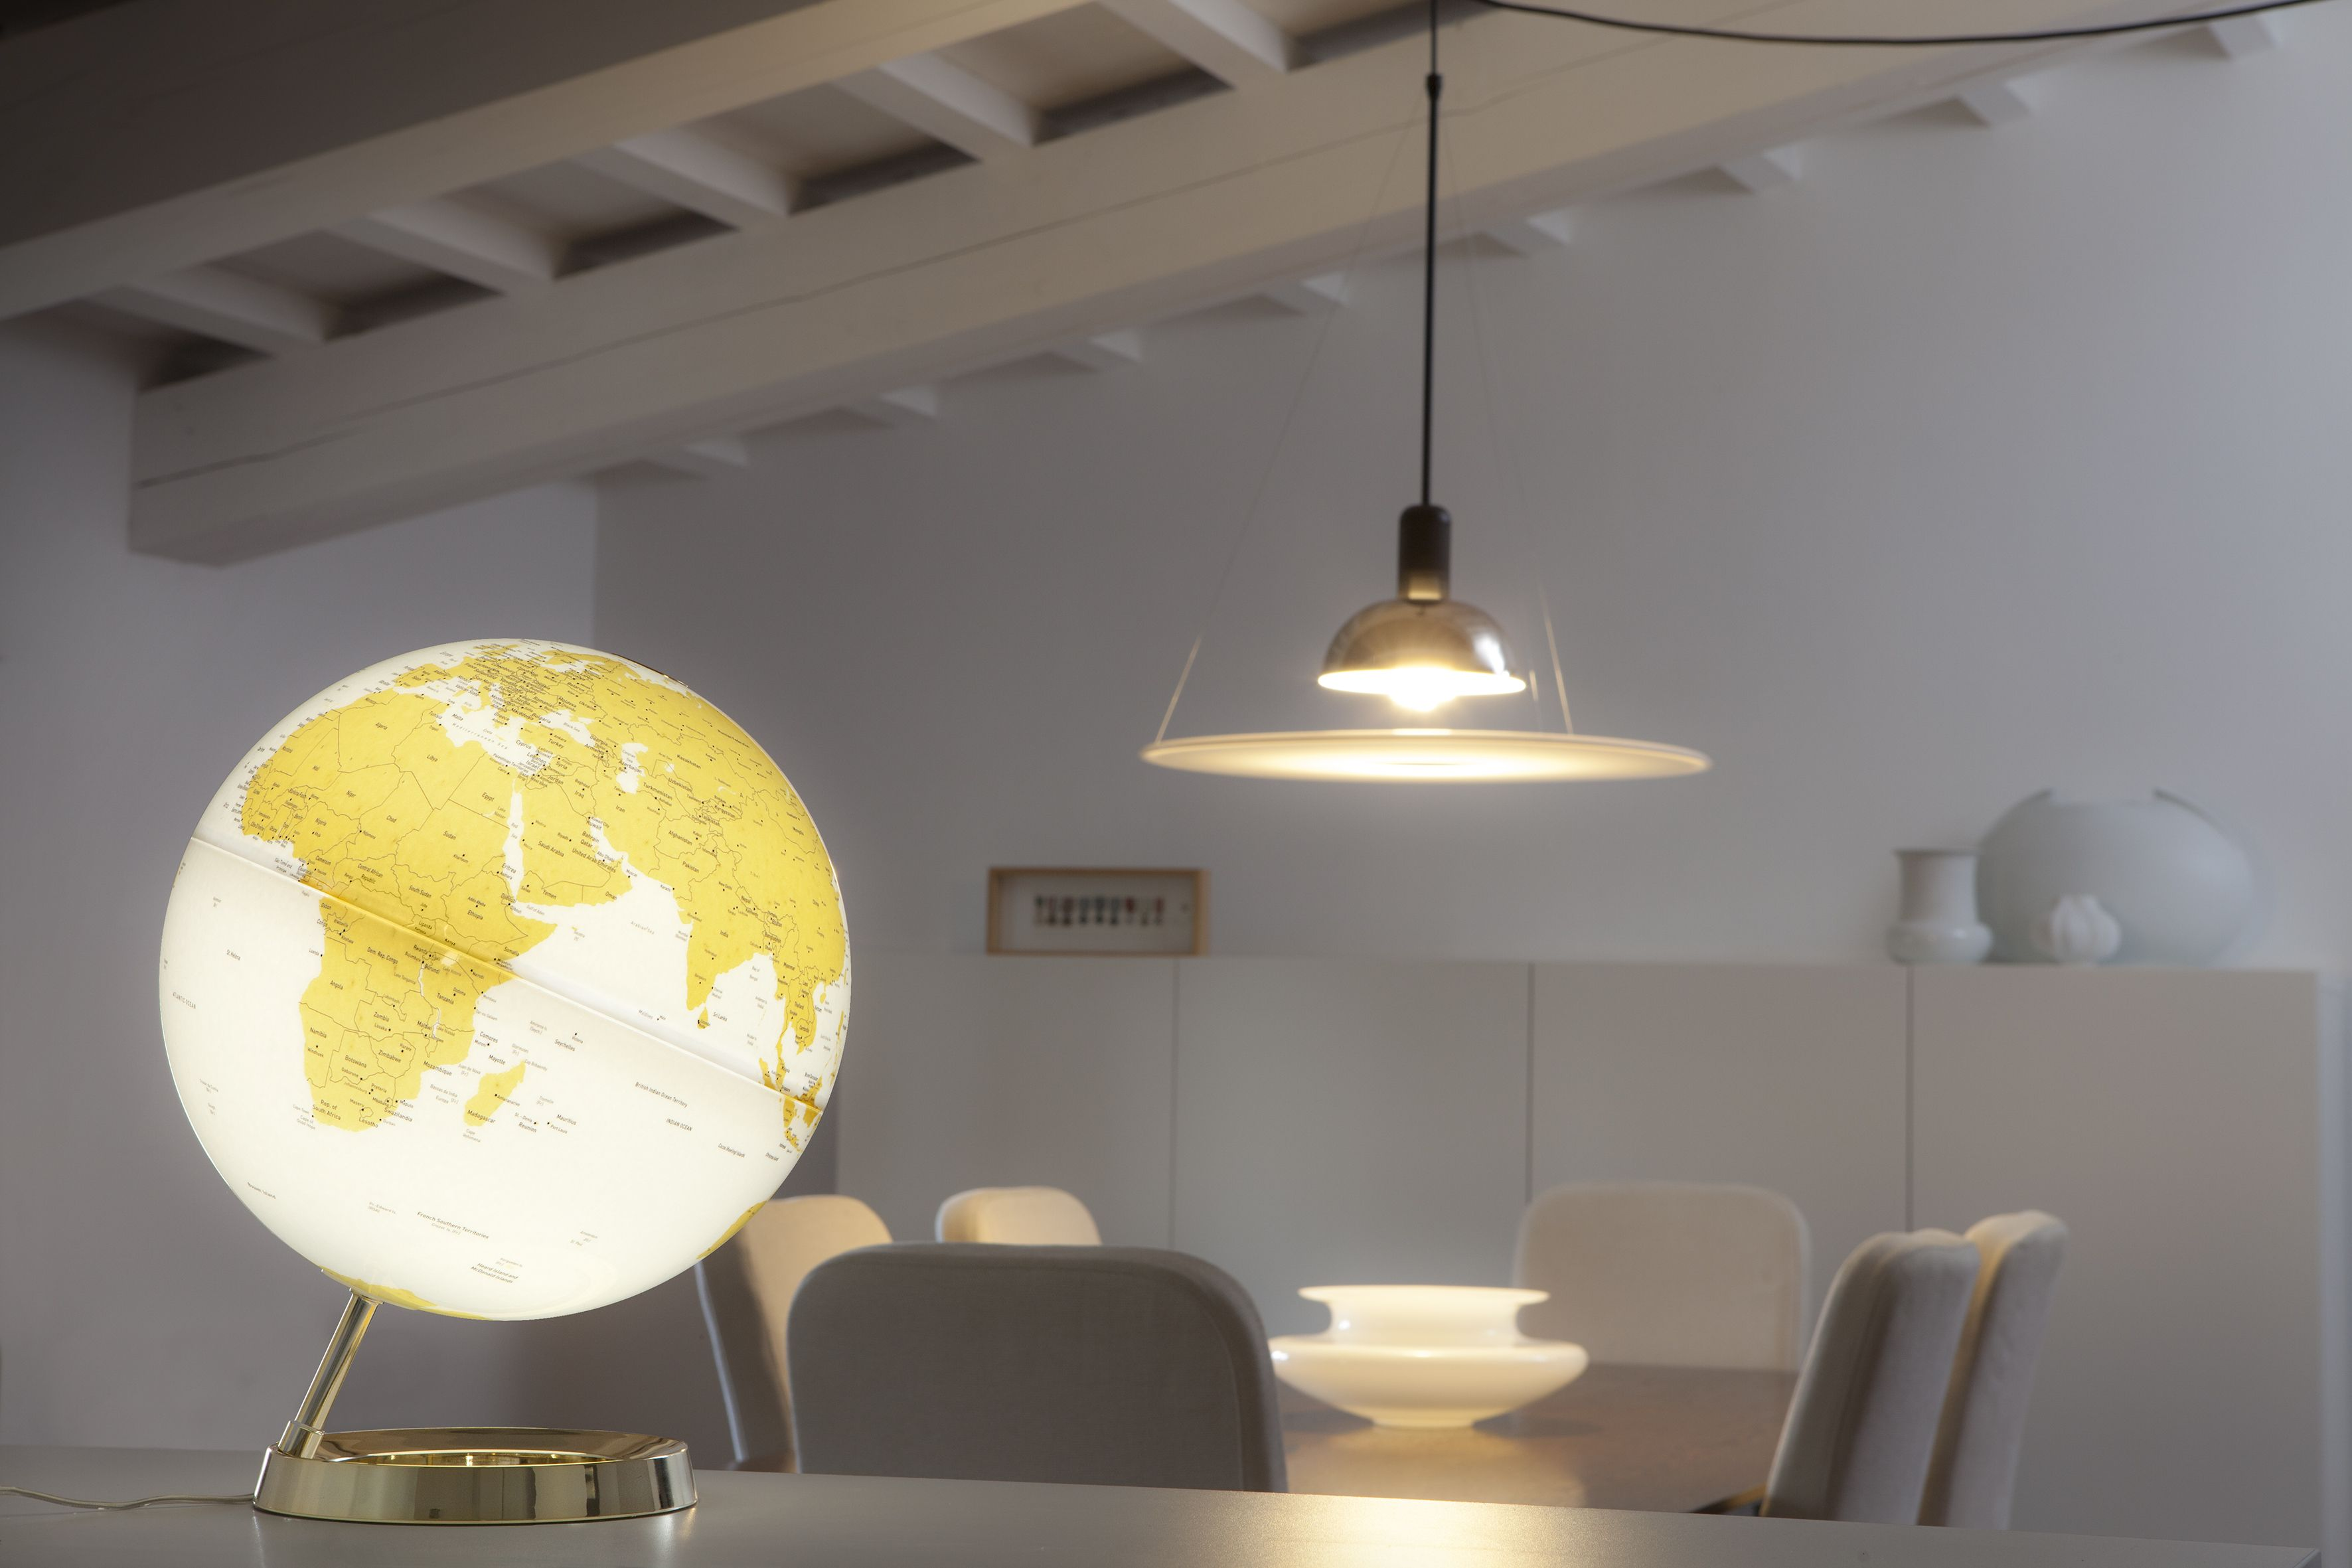 Design-Leuchtglobus Atmosphere Light & Colour Gold EUR 99,00 #interiorinspiration #decorinspiration #apartmenttherapy #decorhome #apartmentlife #abmathome #interiorinspo #interiorideas #interiorarchitecture #madeinitaly #design #worldmap #globes #danishdesign #interiordesign #designlamps